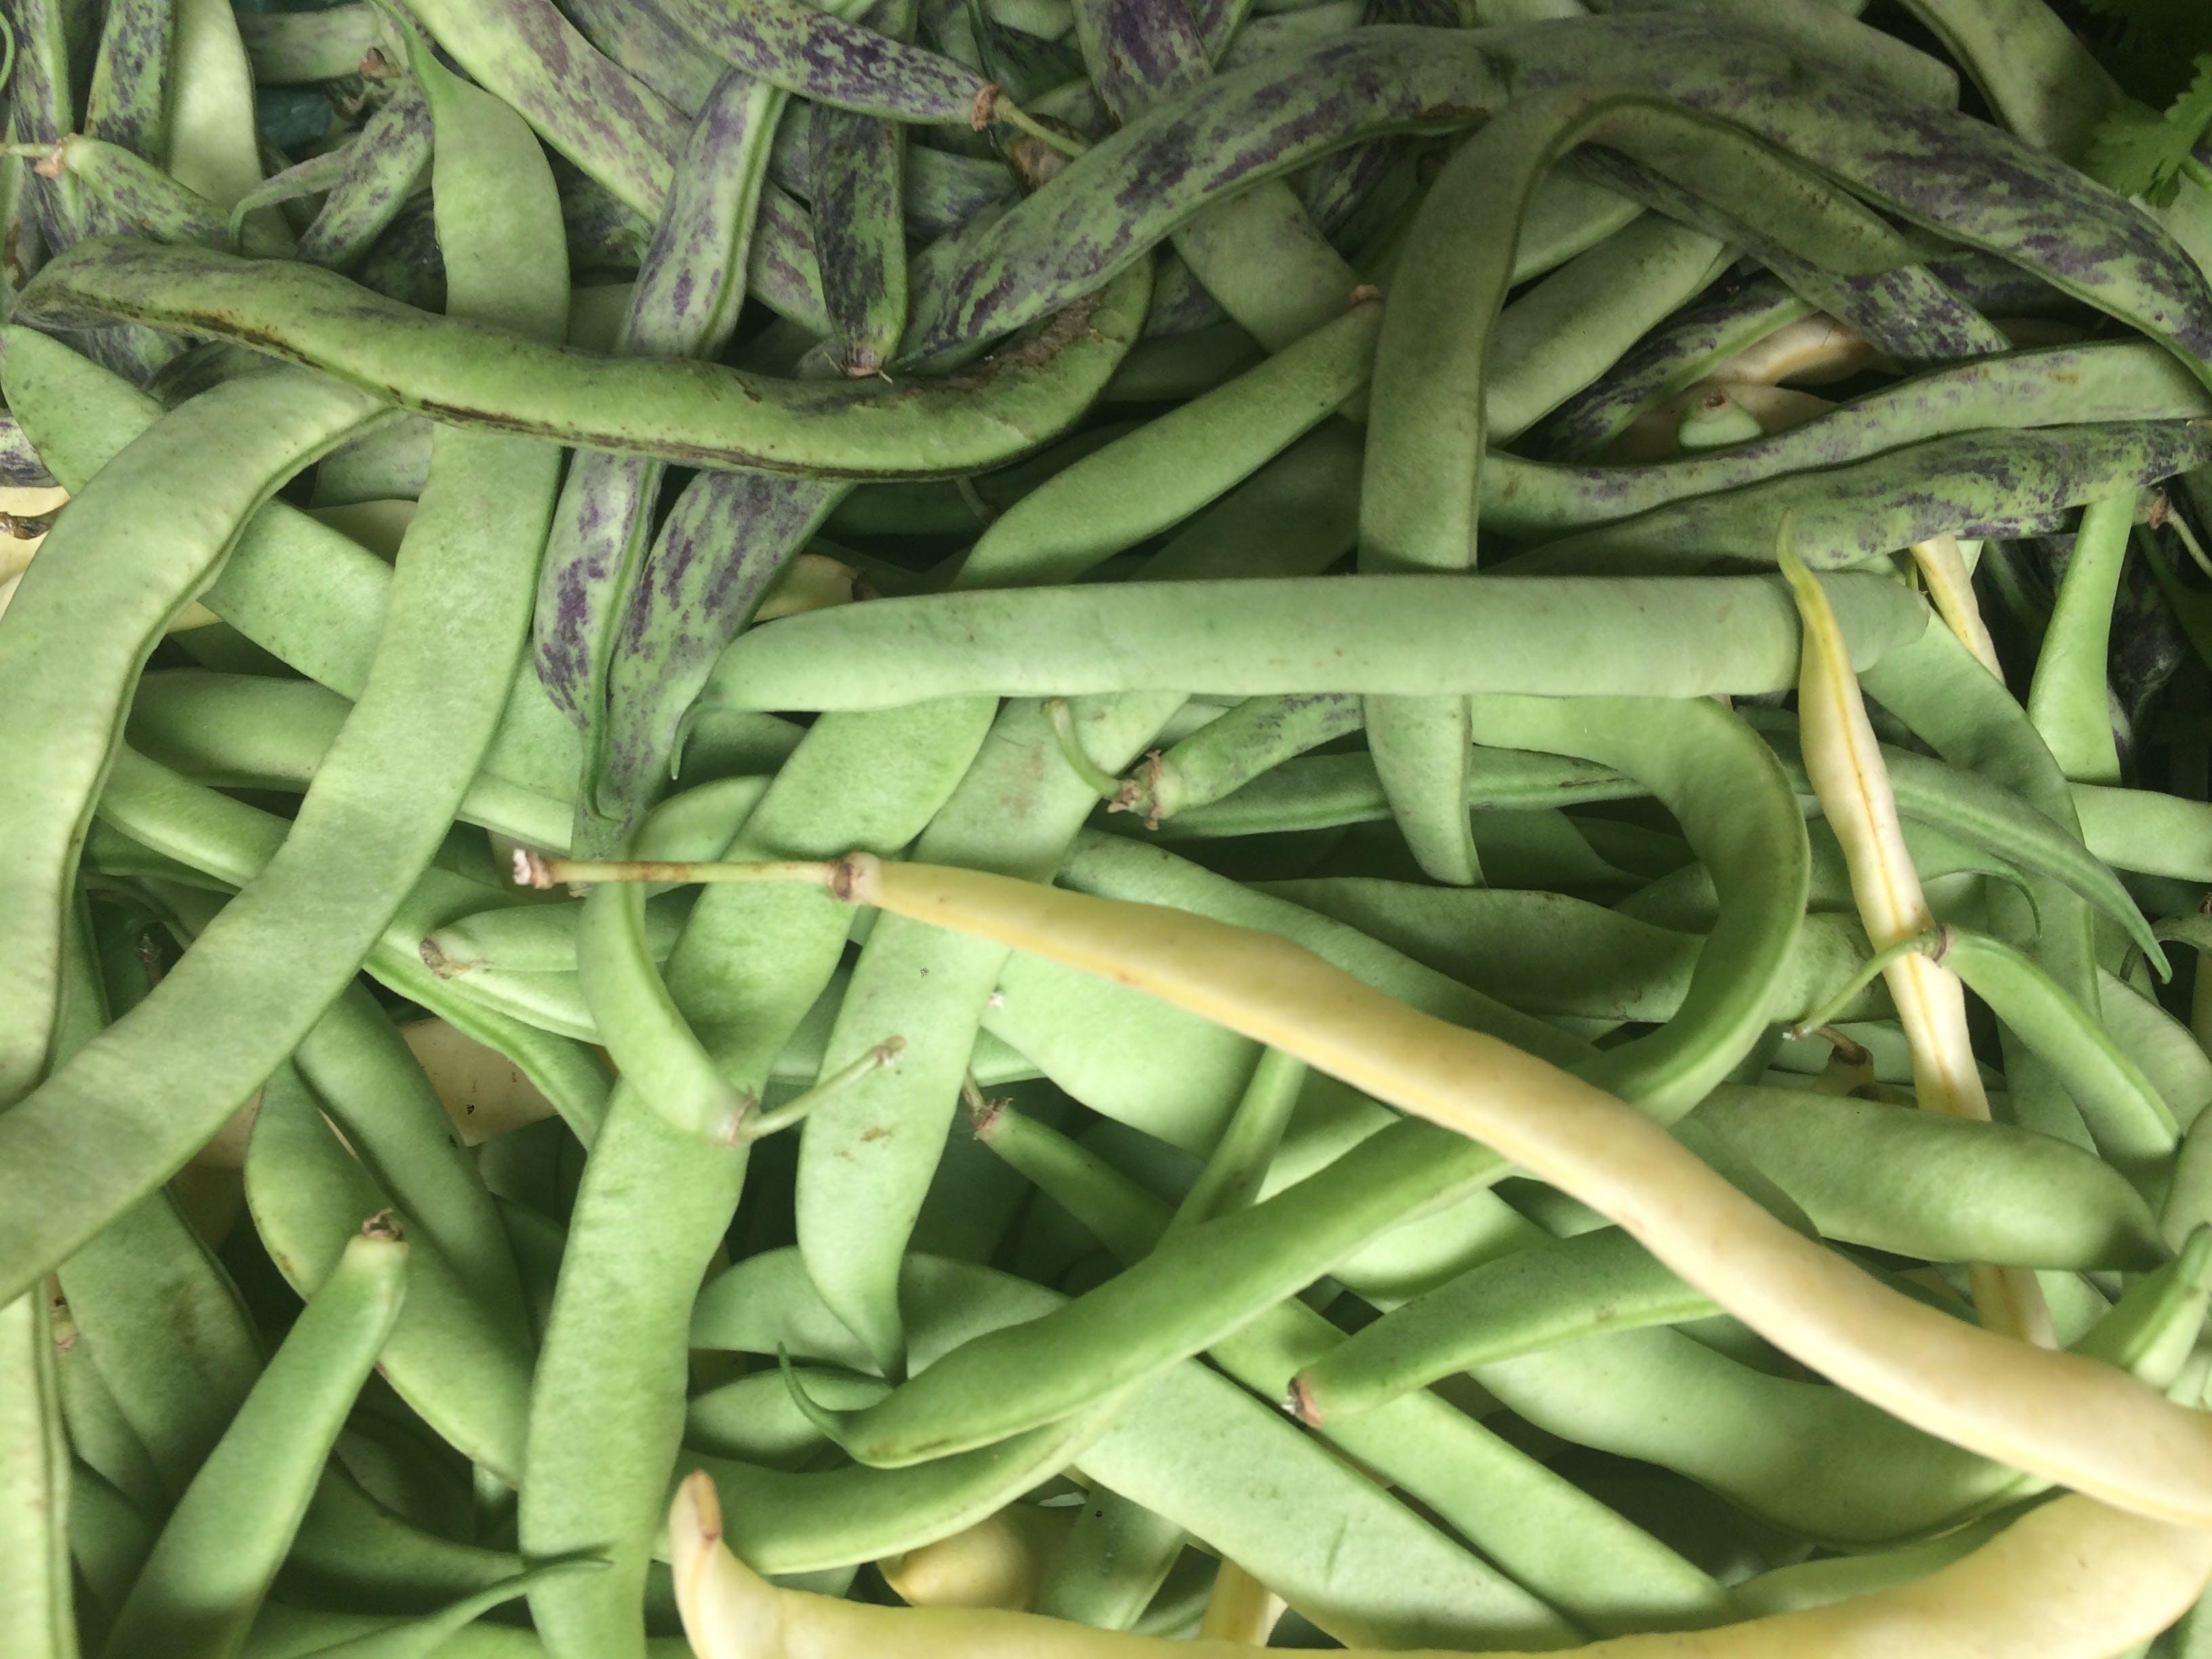 Free stock photo of bean, fresh vegetable, green, green bean